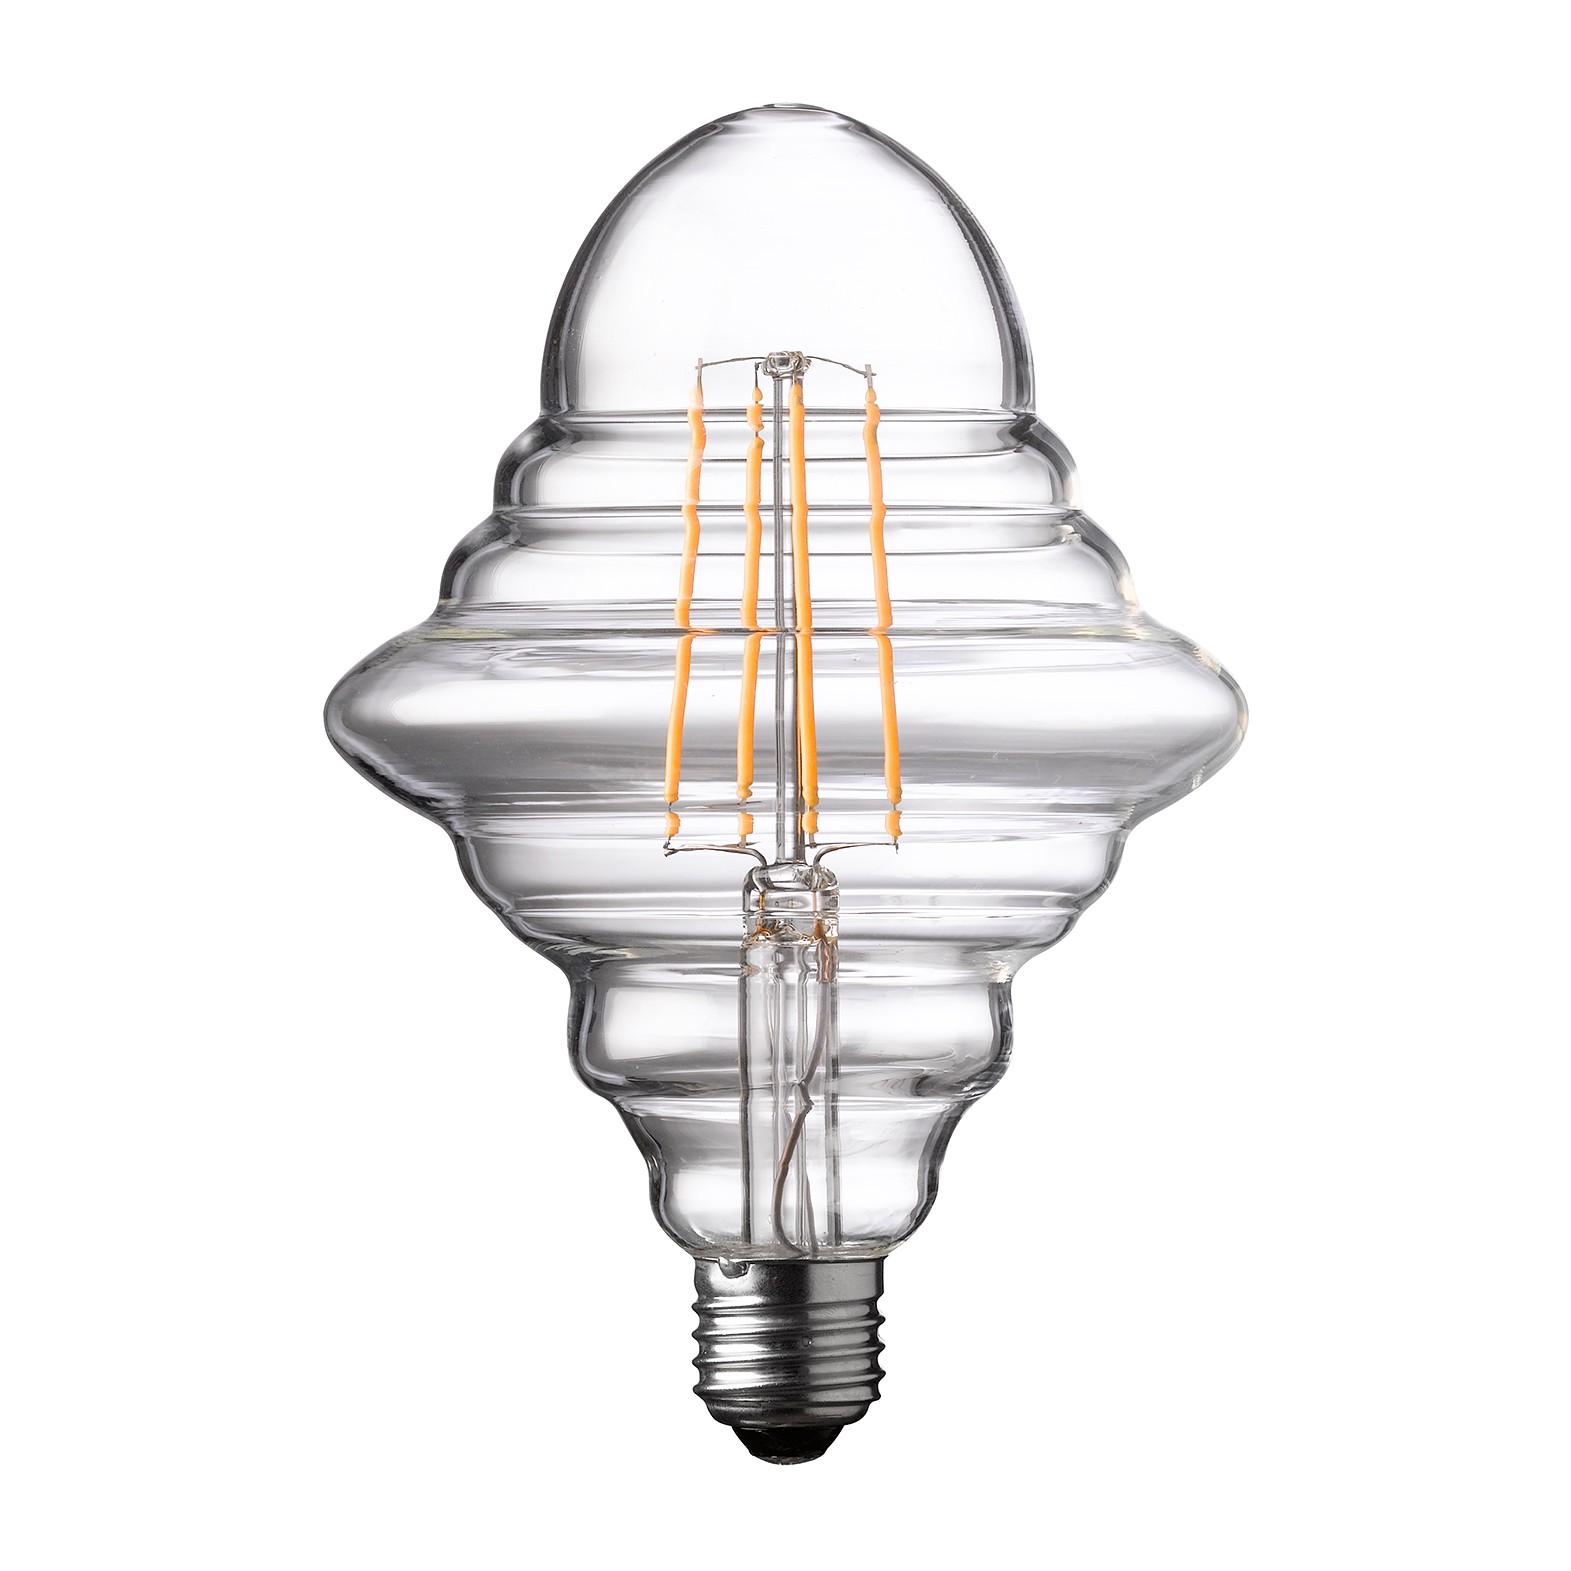 LED Leuchtmittel Finn III kaufen   home24